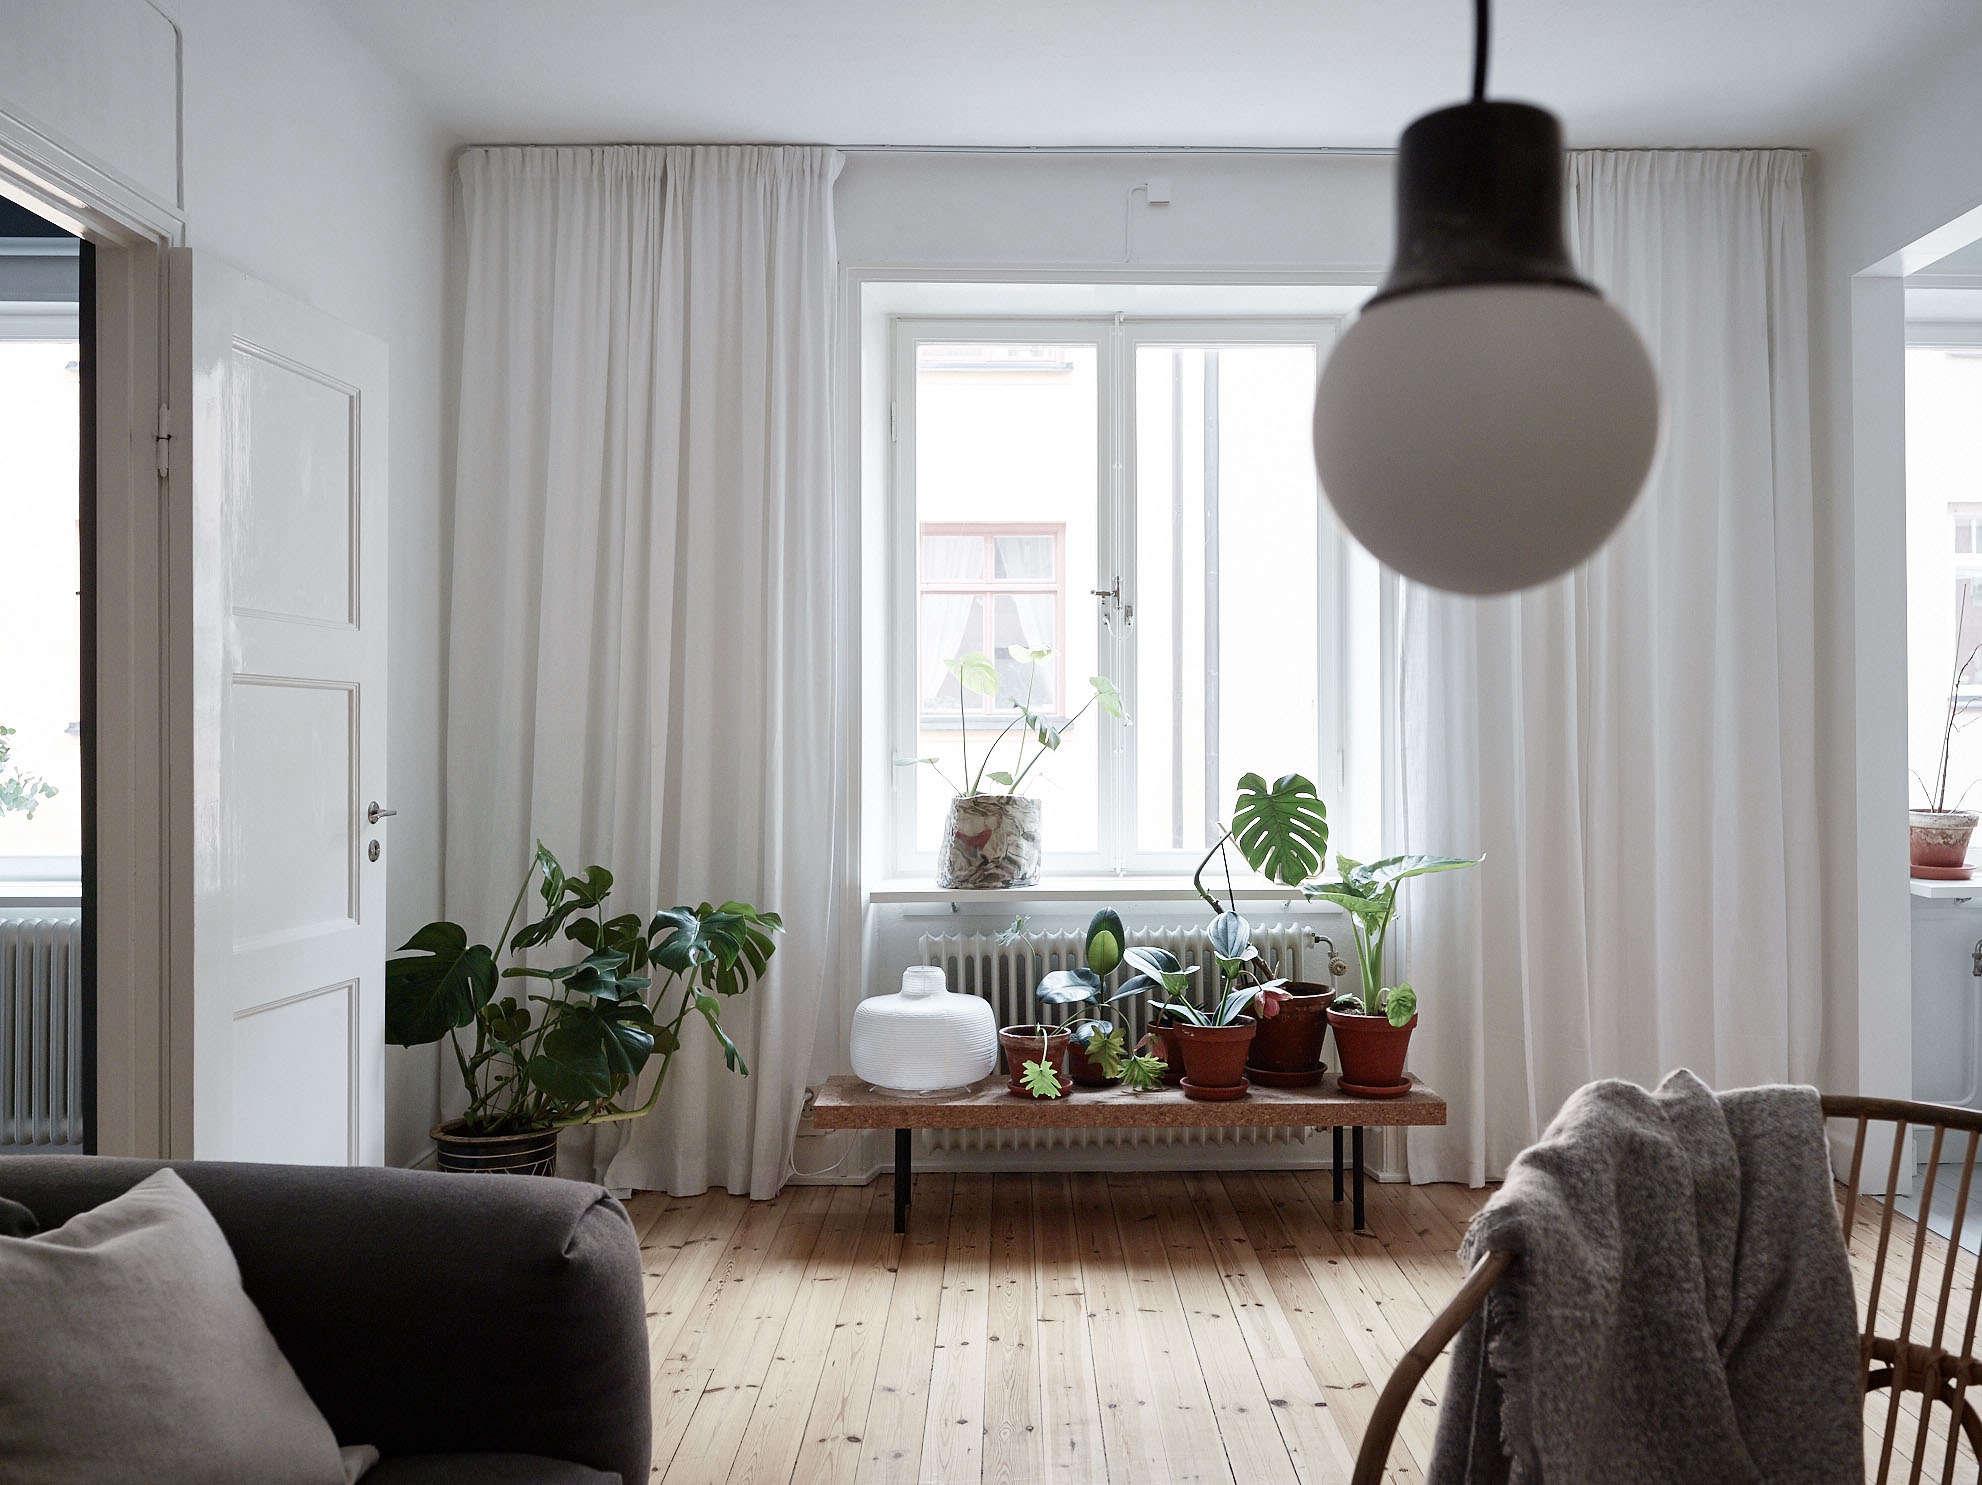 stockholm-apartment-historiskahem-2